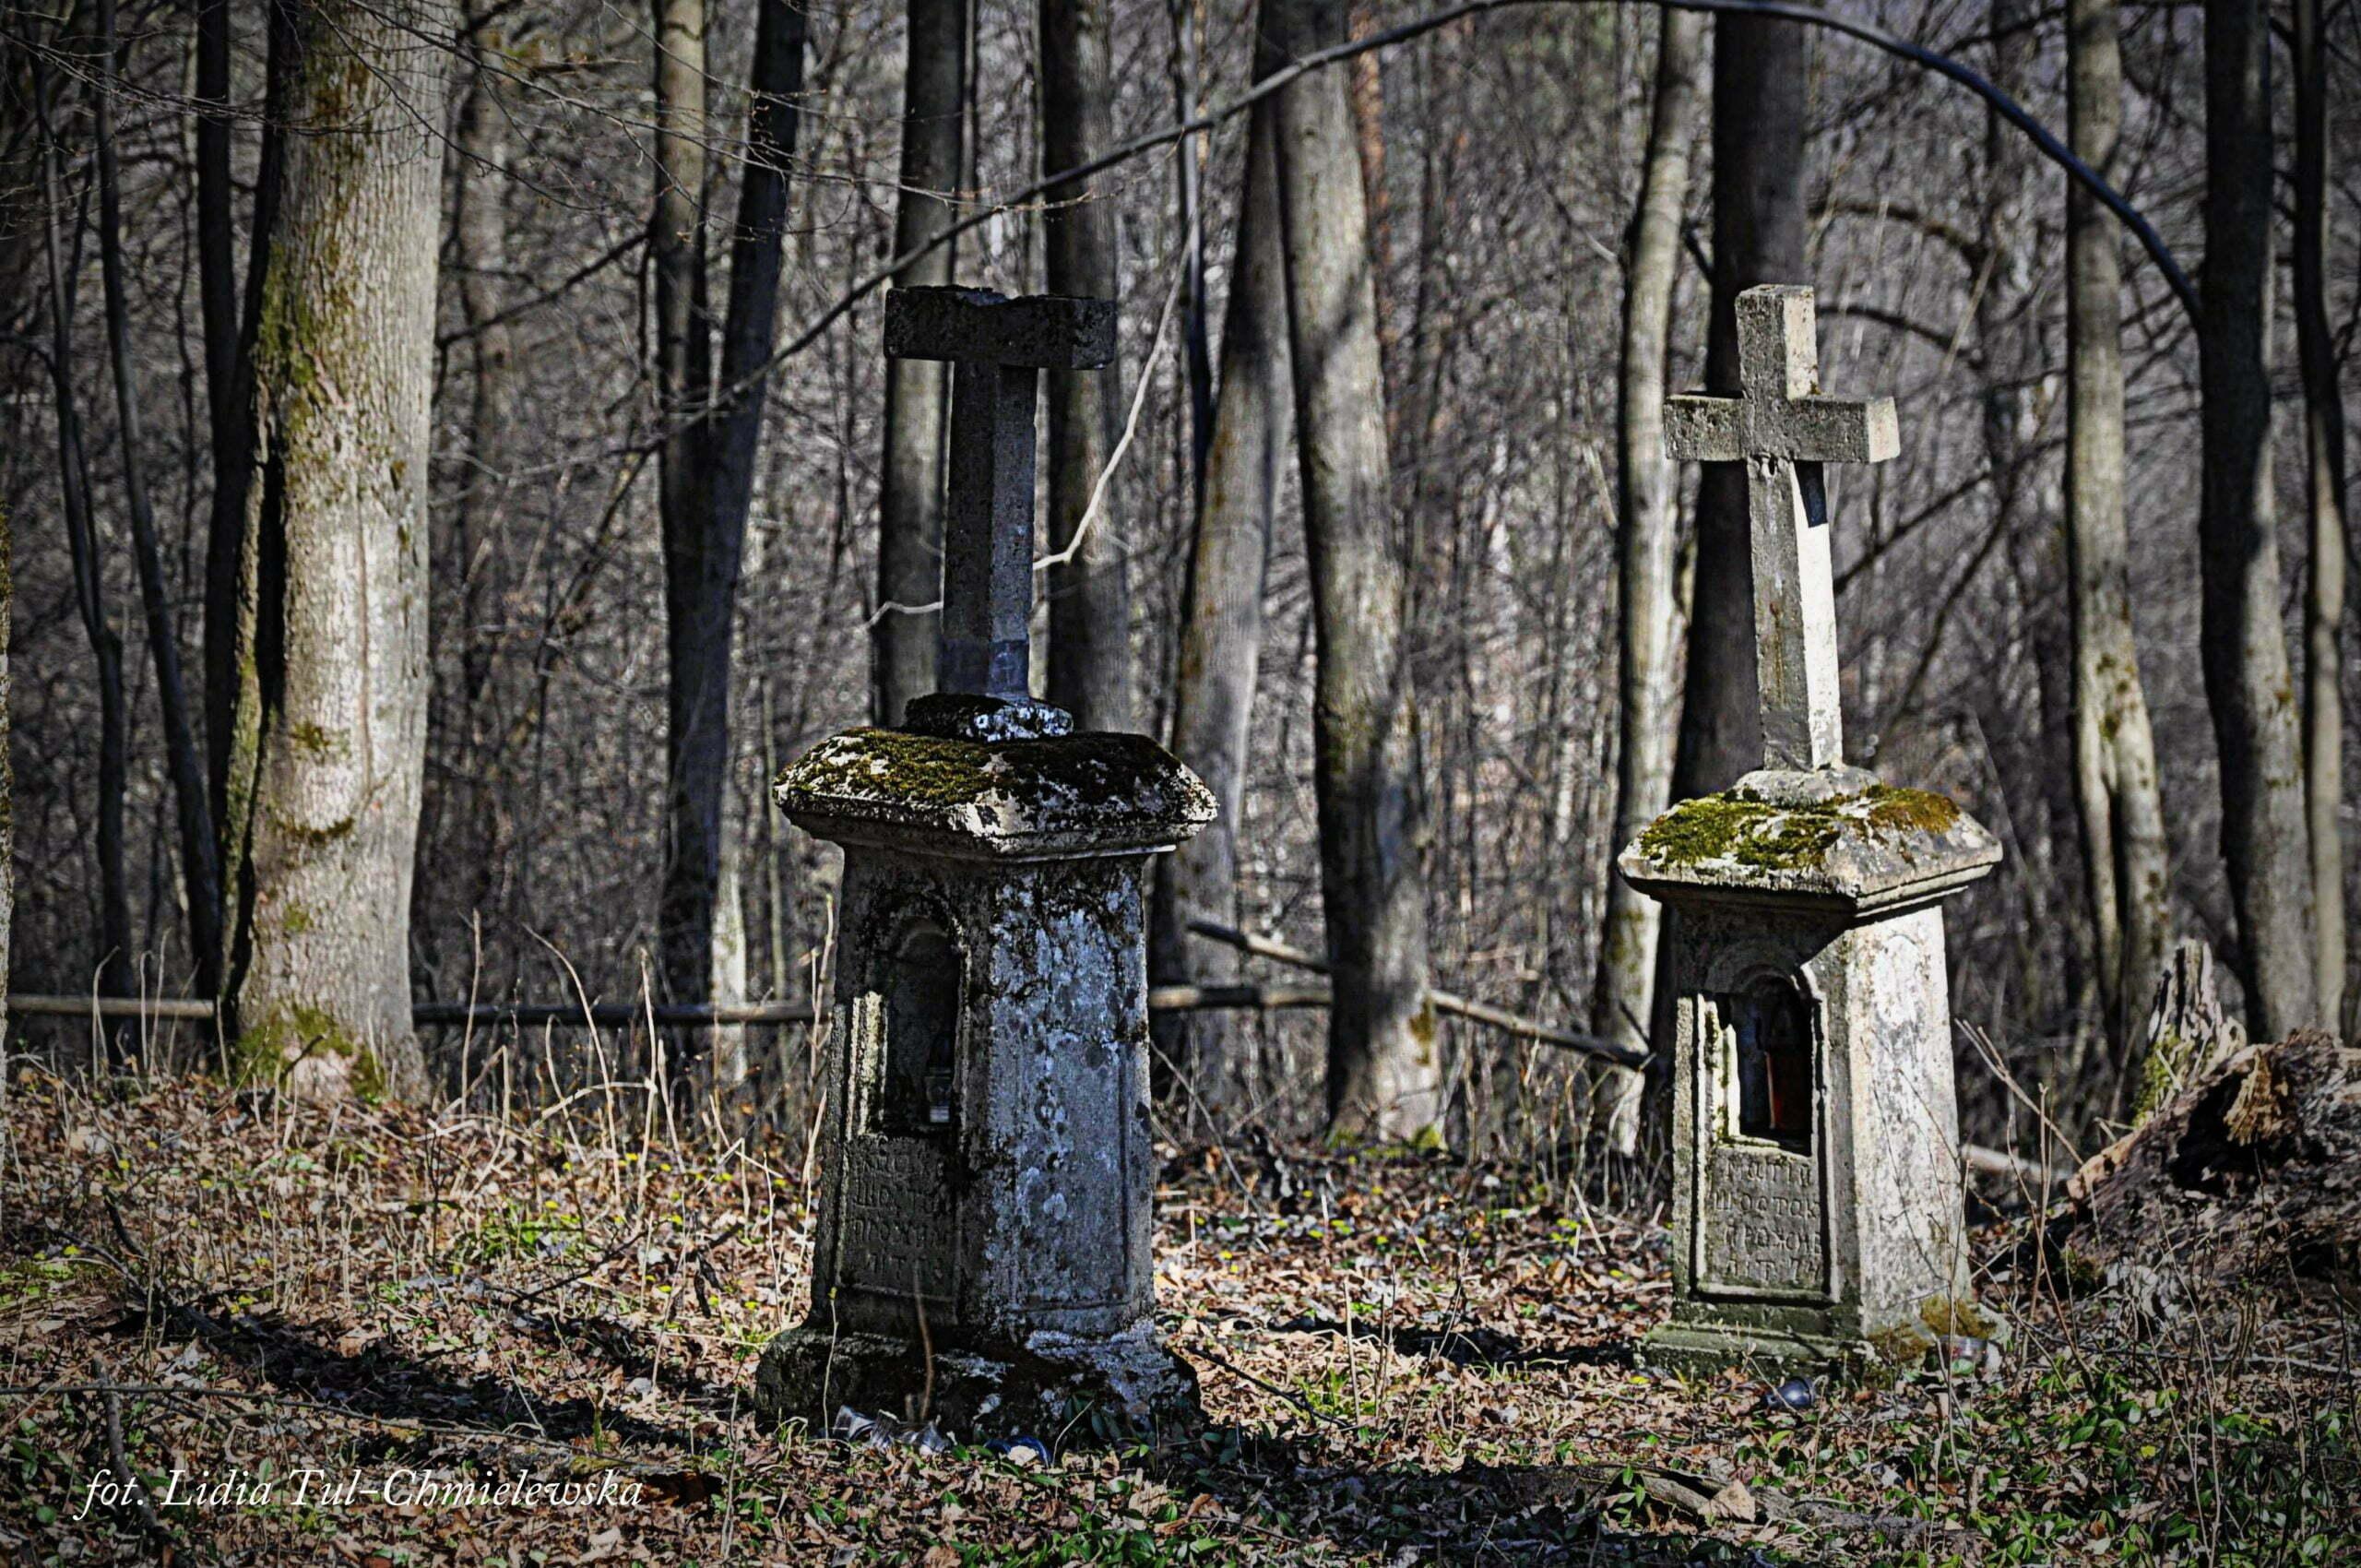 Horodek - stary cmentarz / fot. Lidia Tul-Chmielewska